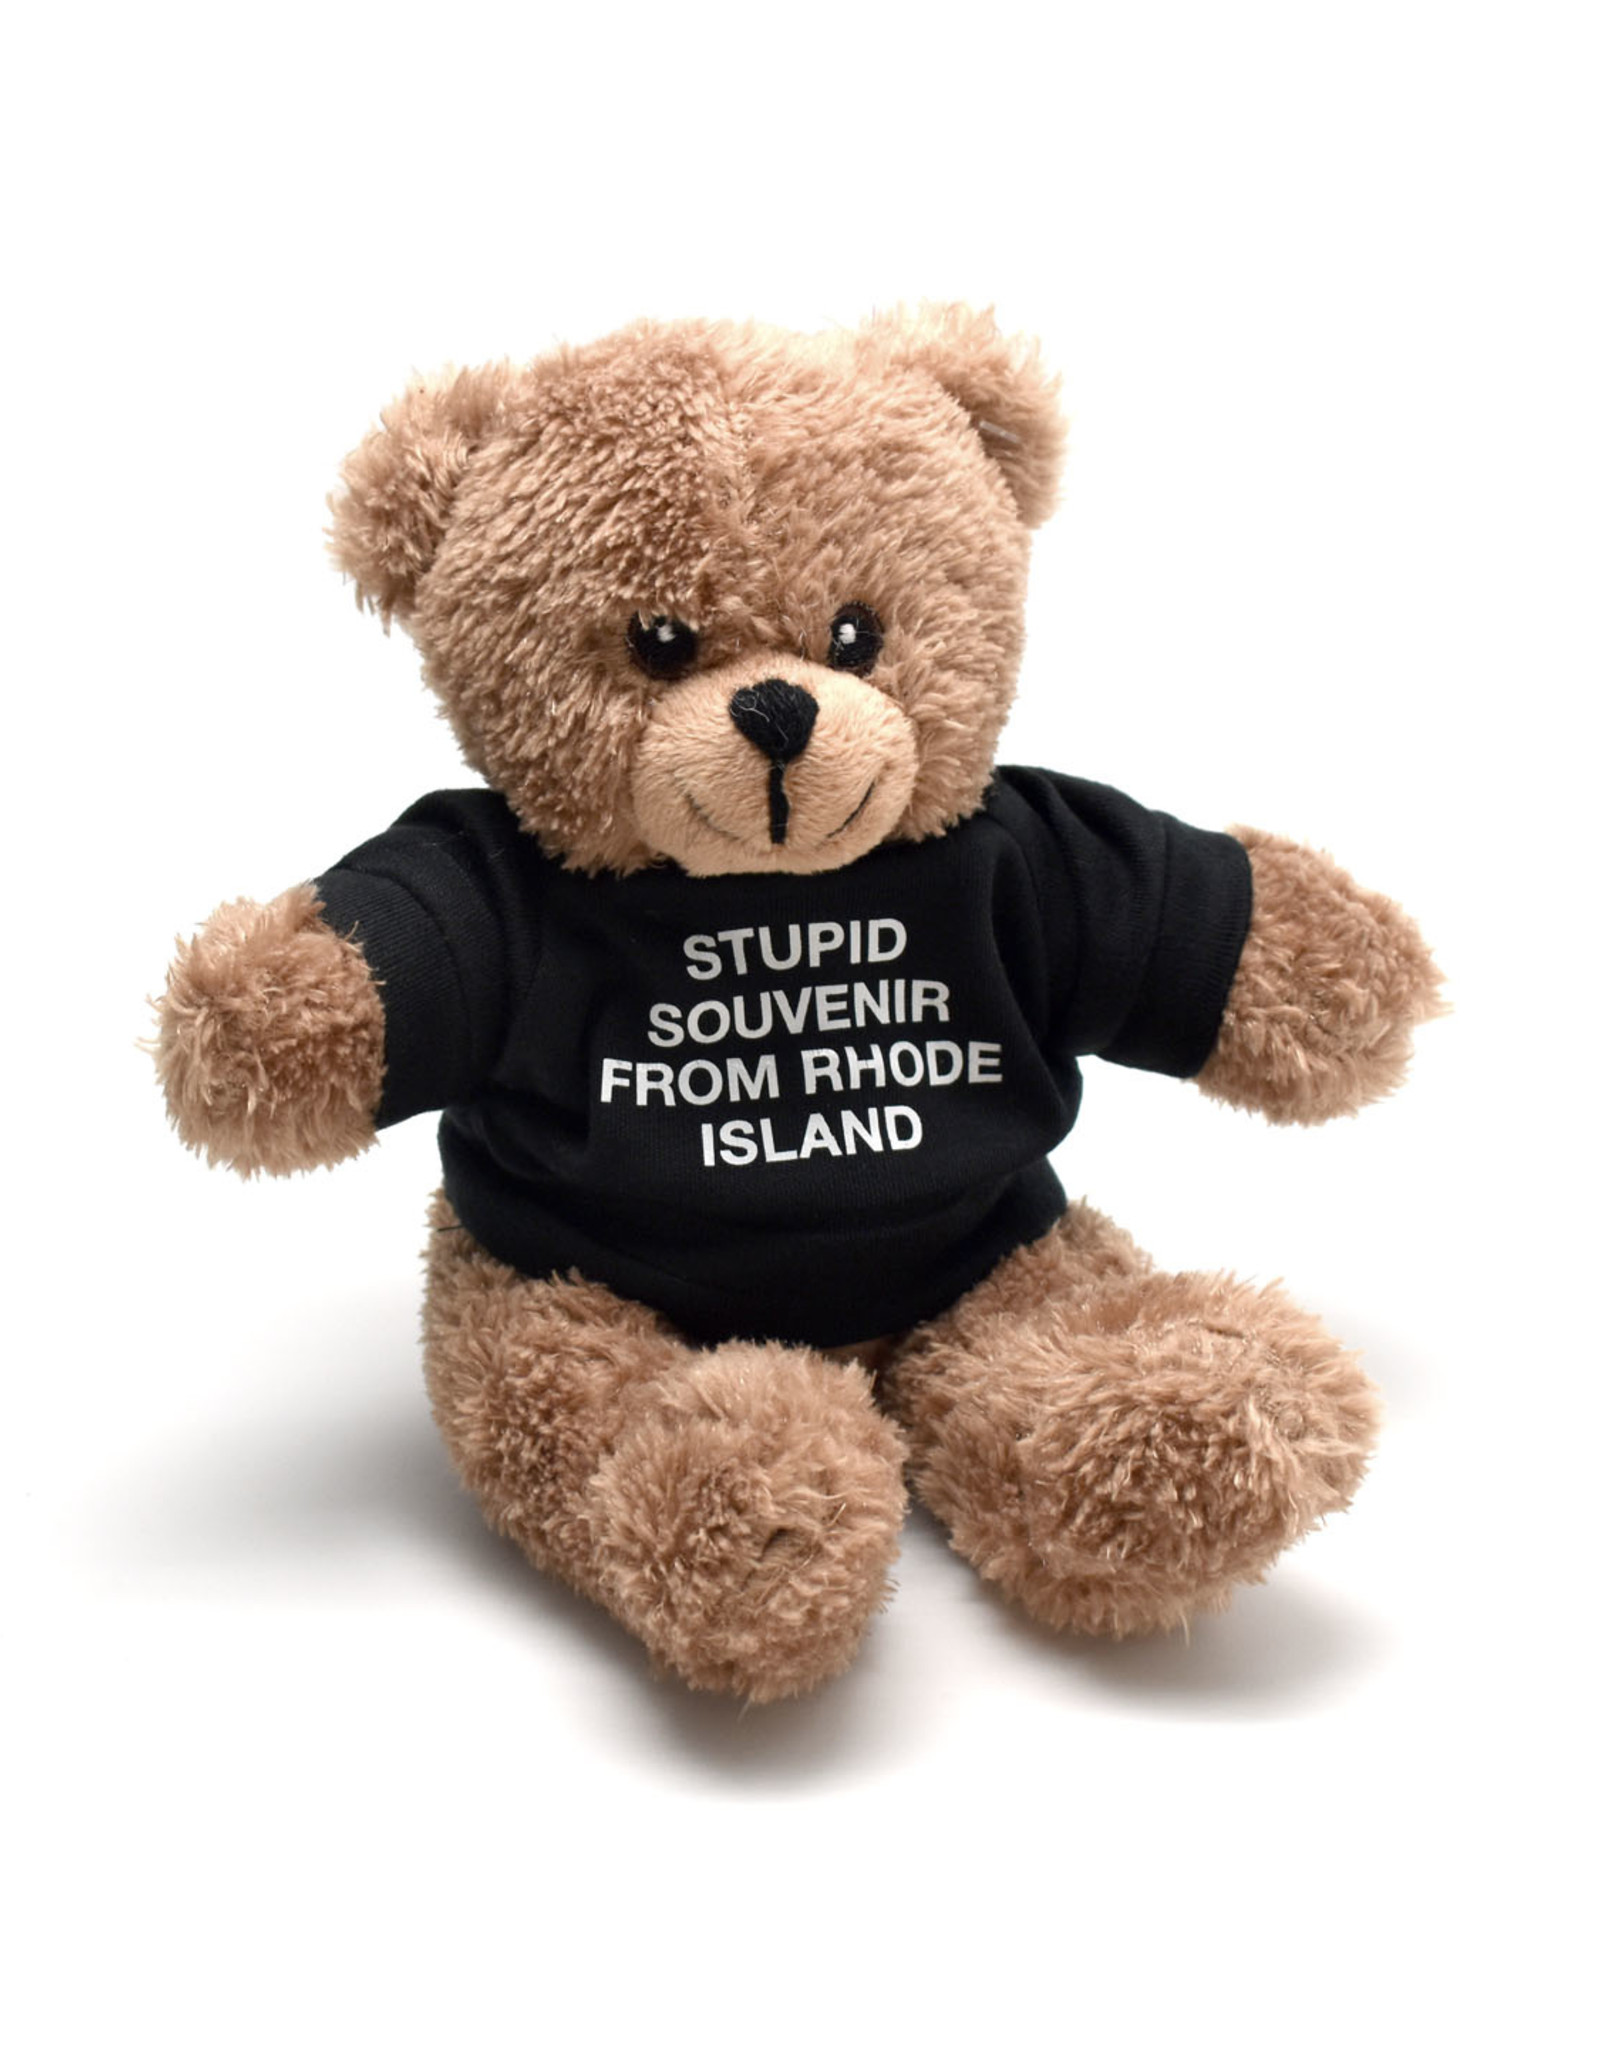 A Stupid Souvenir From Rhode Island Teddy Bear